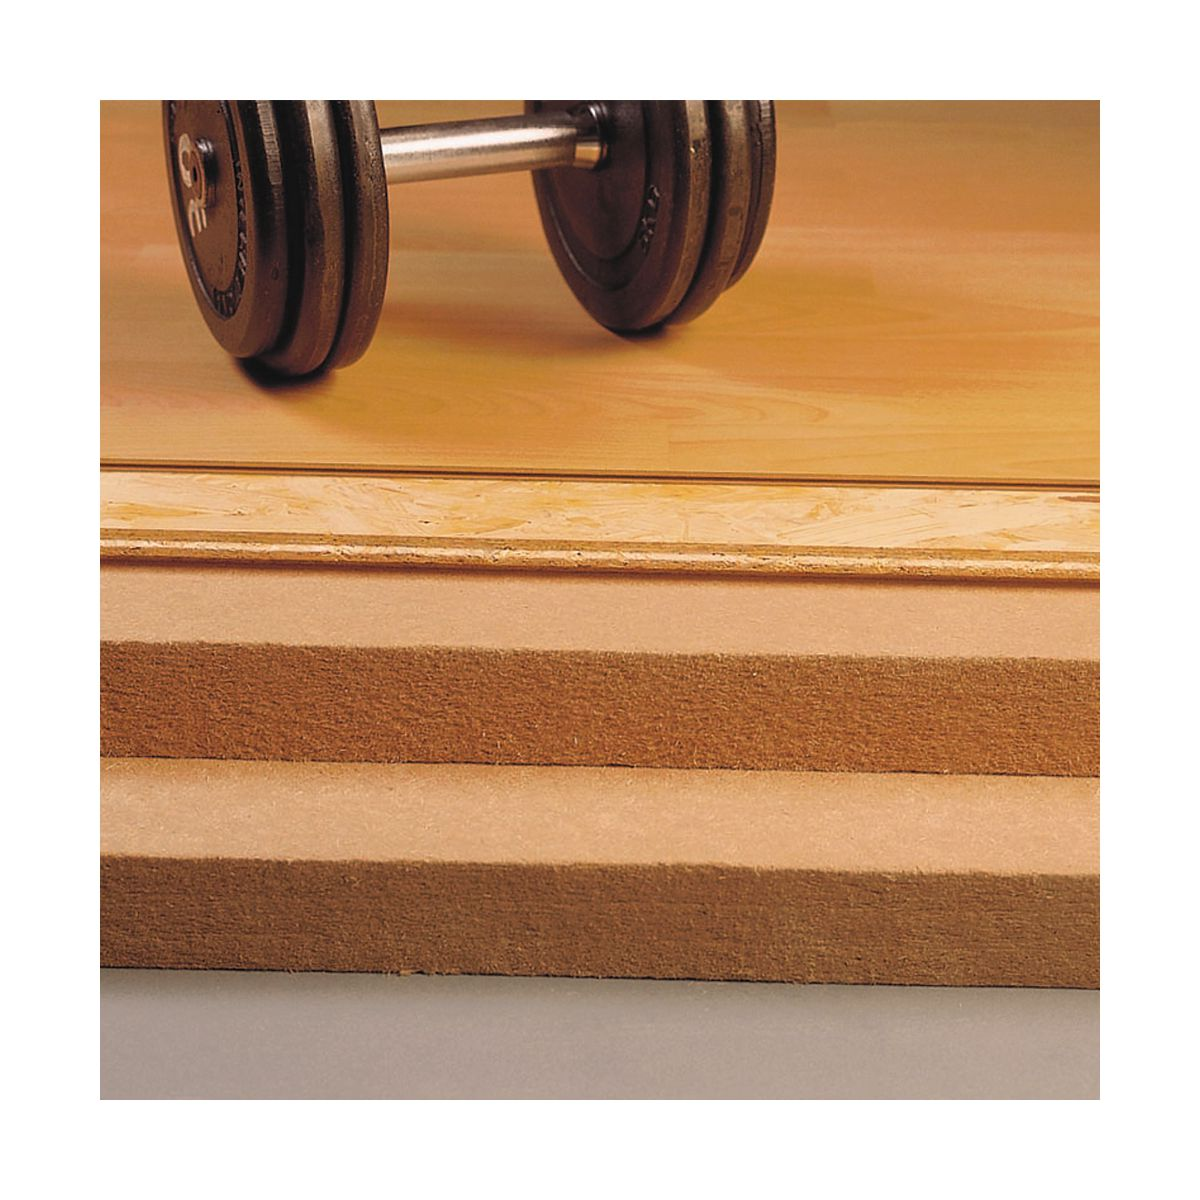 tarif pavatex great agrandir la carte with tarif pavatex fibre glass mesh roll with tarif. Black Bedroom Furniture Sets. Home Design Ideas